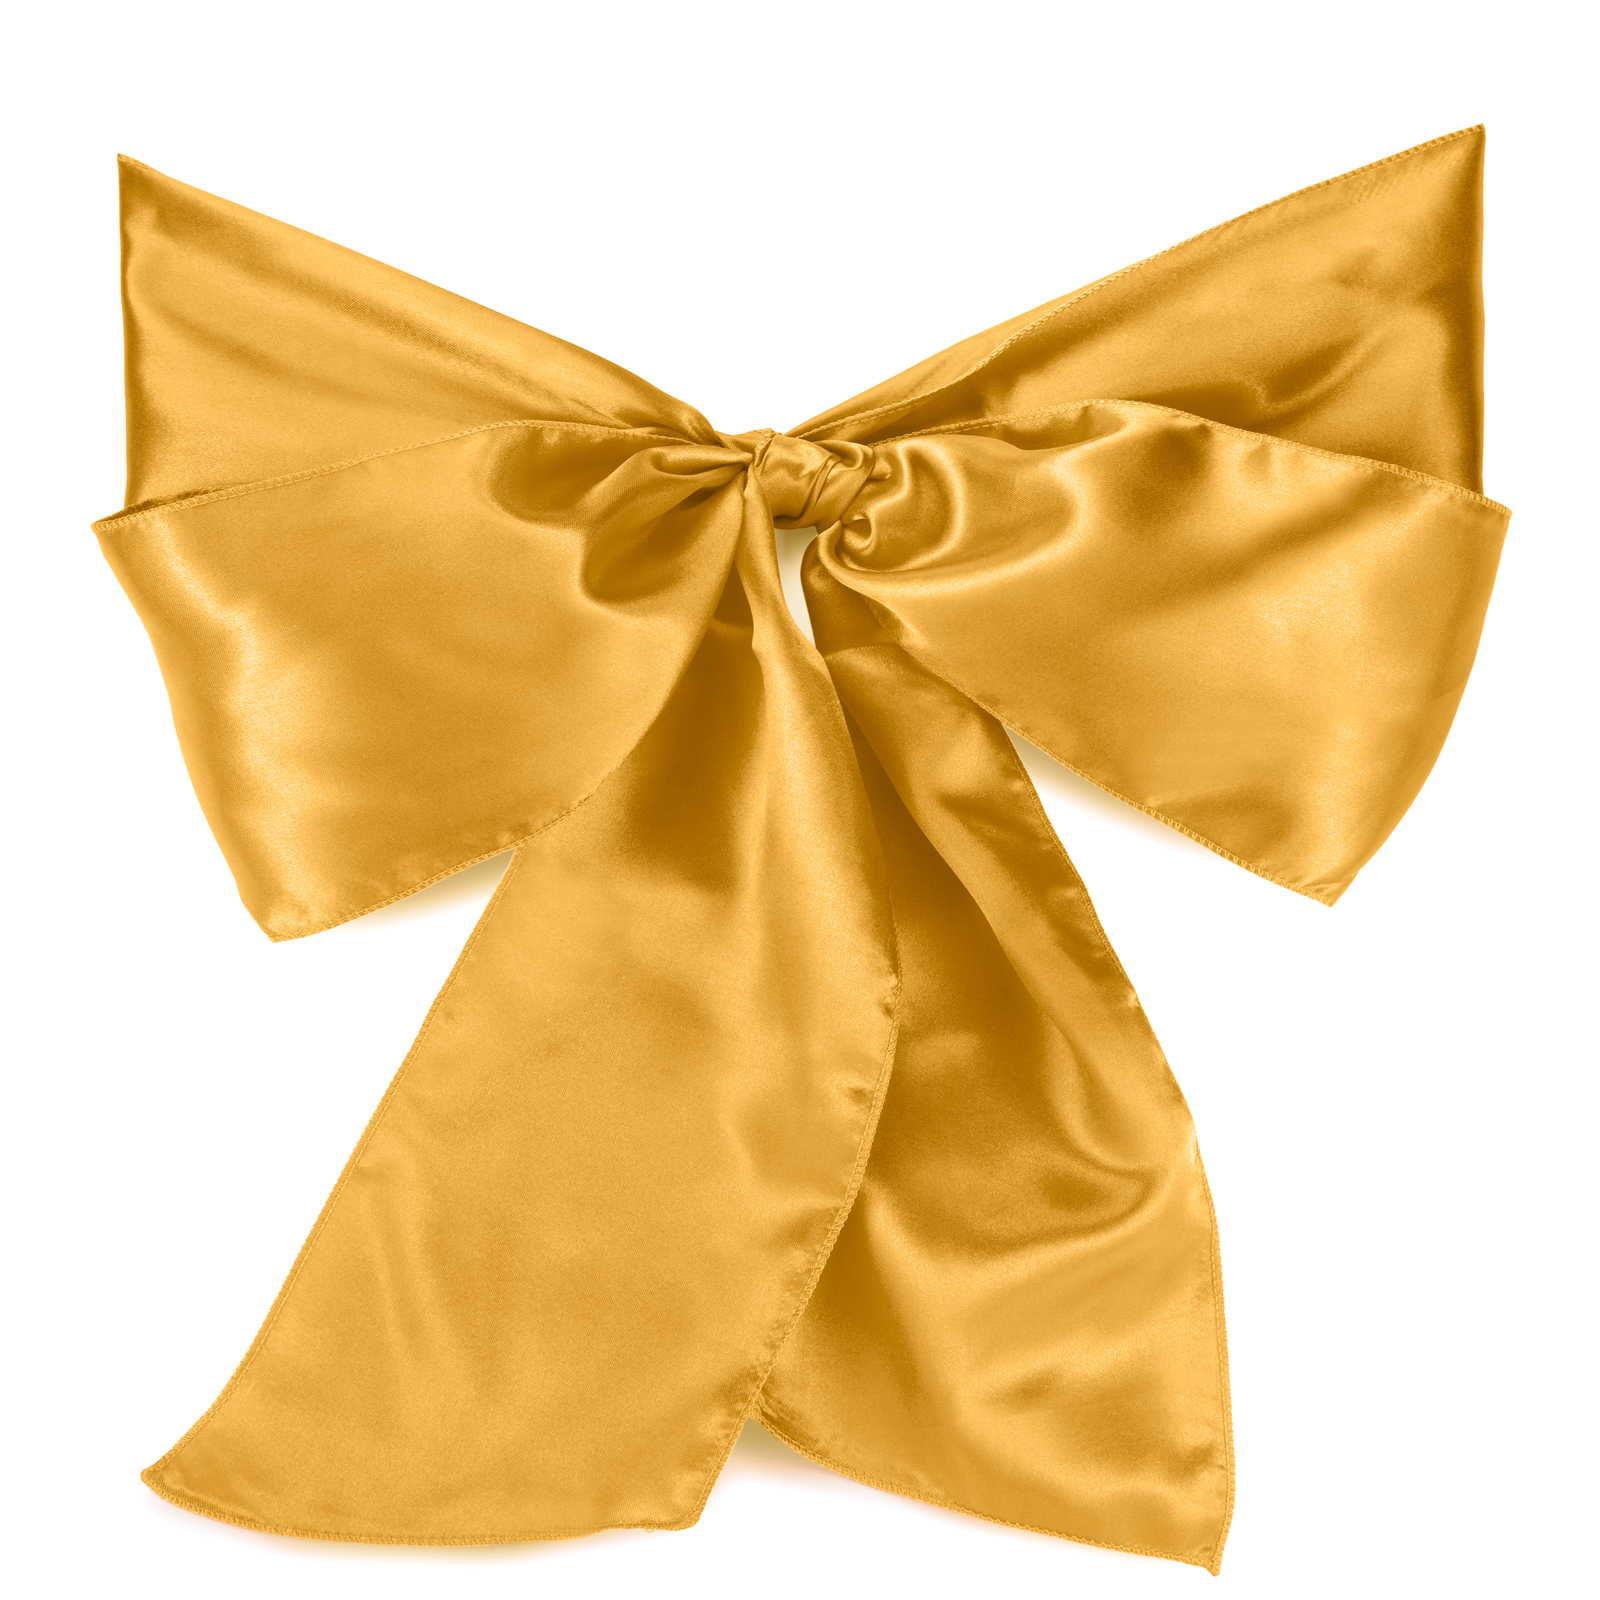 Lann's Linens - 10 Elegant Satin Wedding/Party Chair Cover Sashes/Bows - Ribbon Tie Back Sash (Multiple Colors)